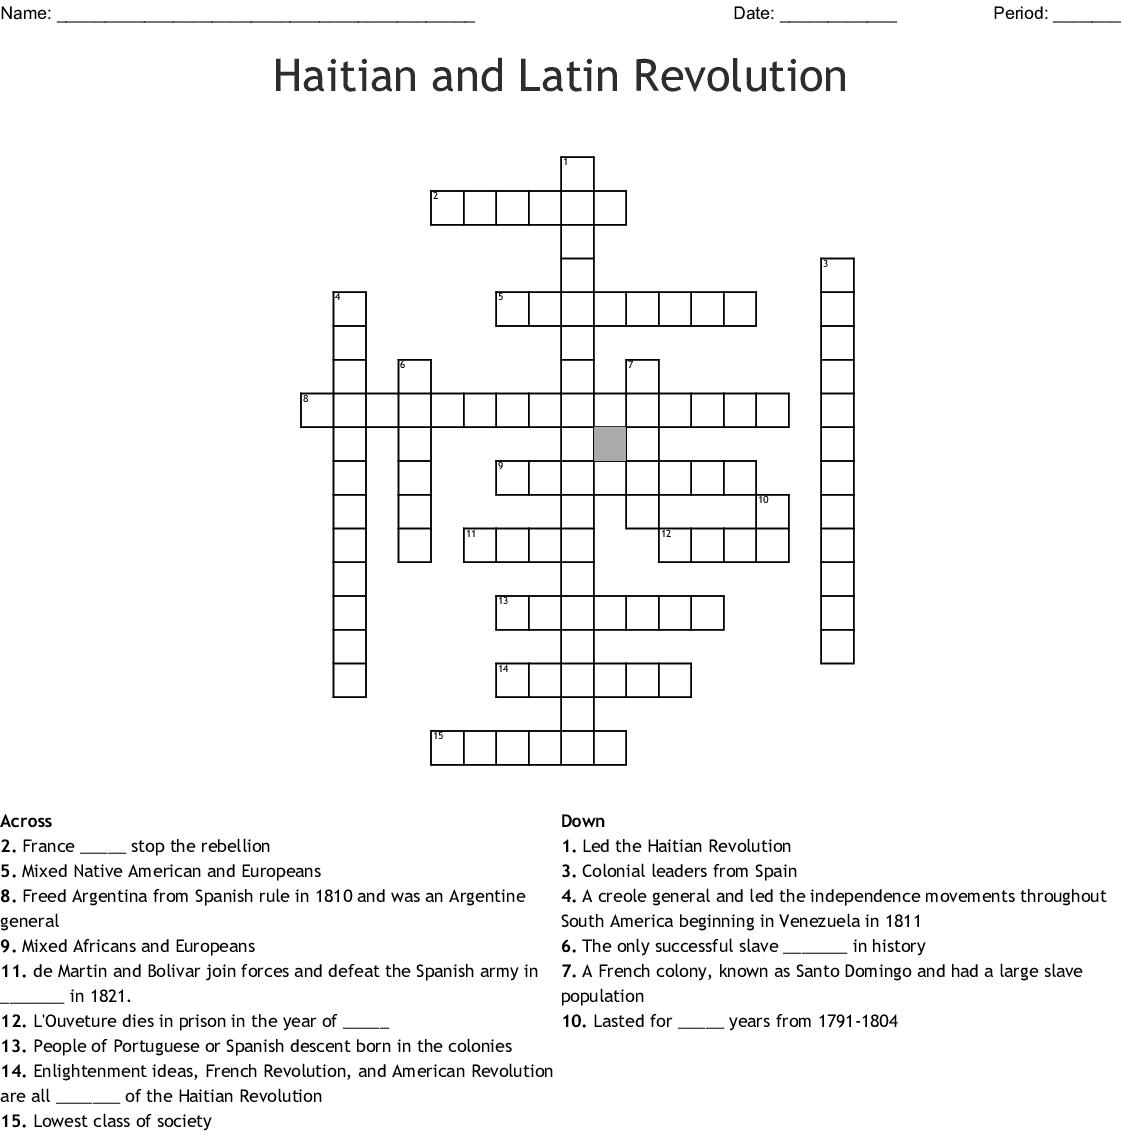 Latin American Revolution Crossword Puzzle